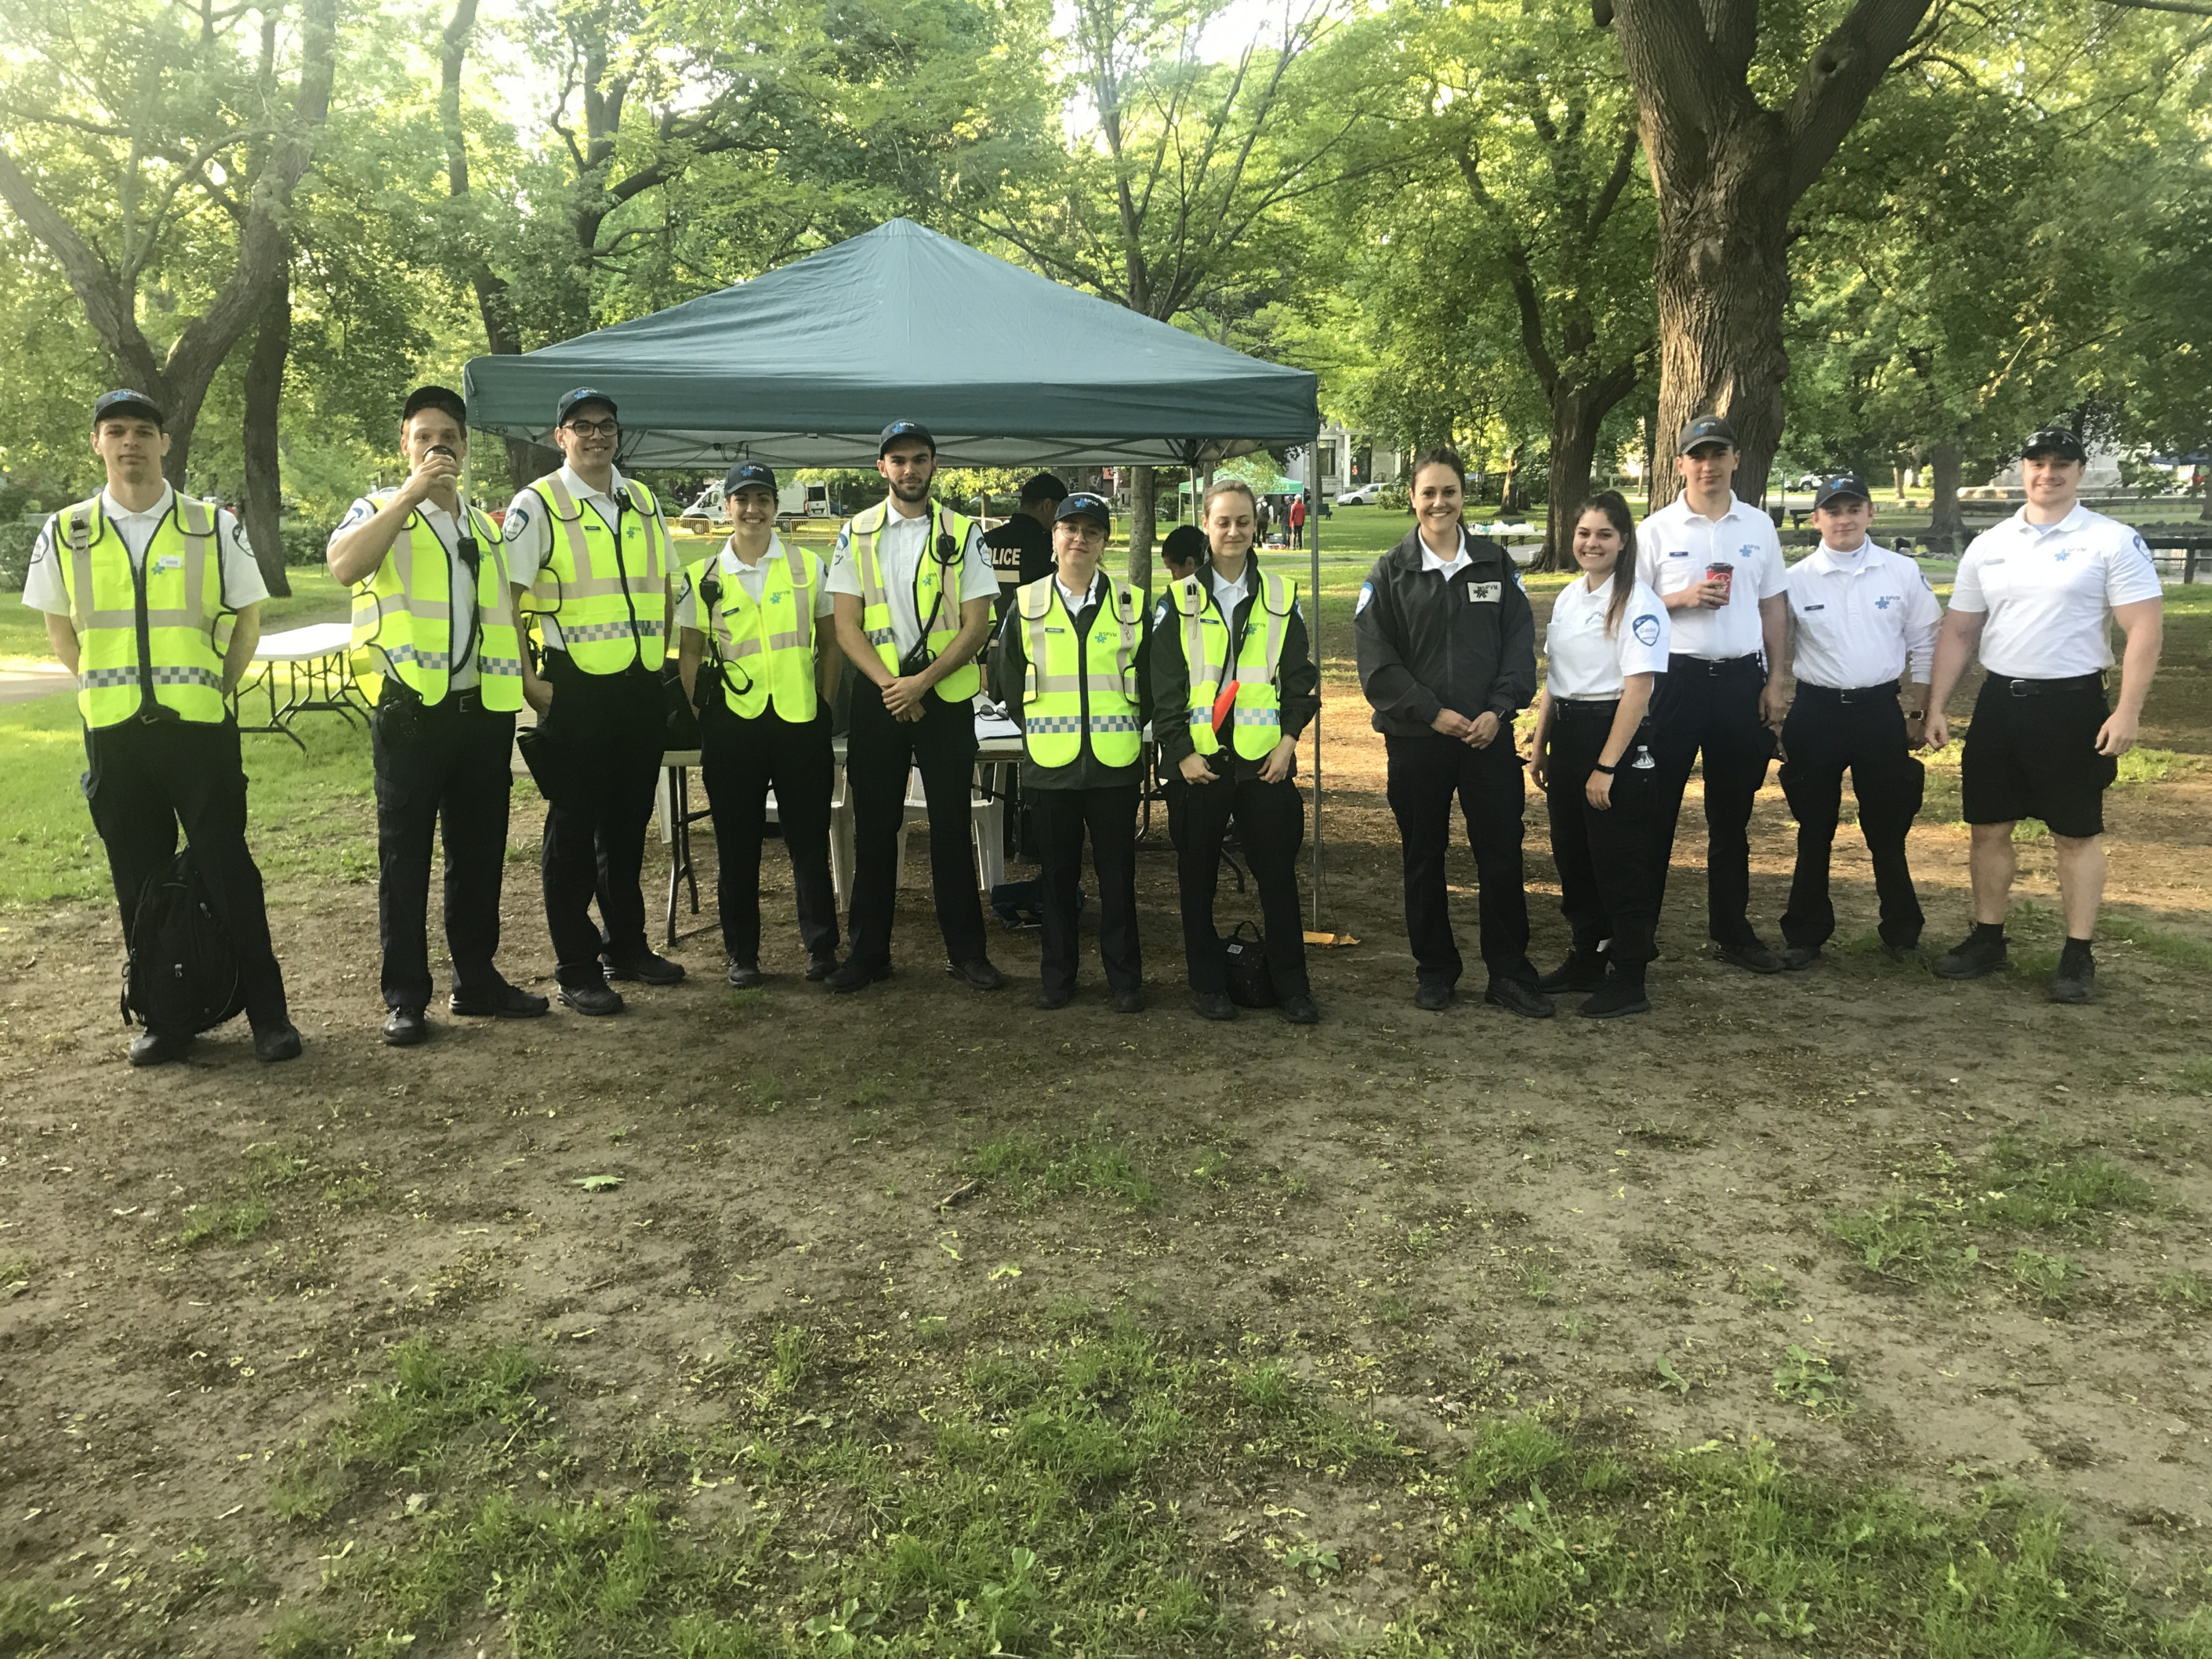 Foulée des Parcs 2019 Equipe Police